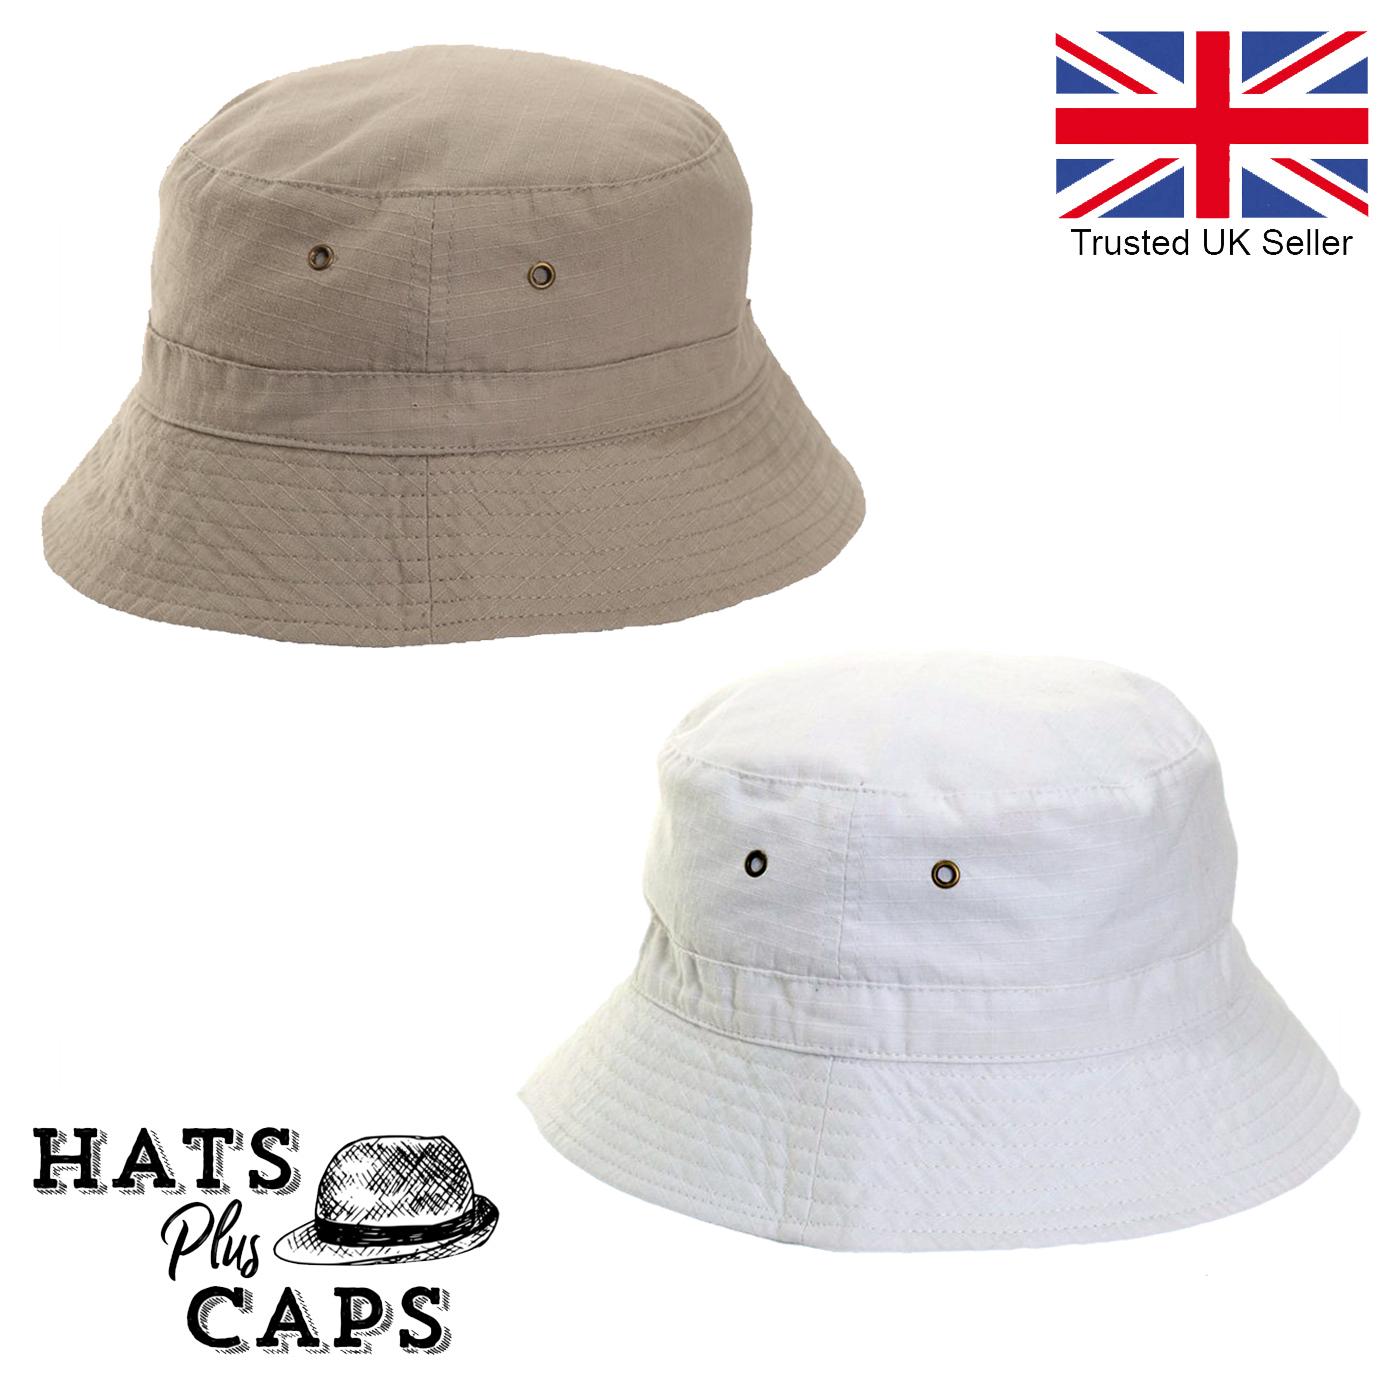 Men /& Women/'s Bush Bucket Sun Hat with Added Pocket Summer Cotton Cap New